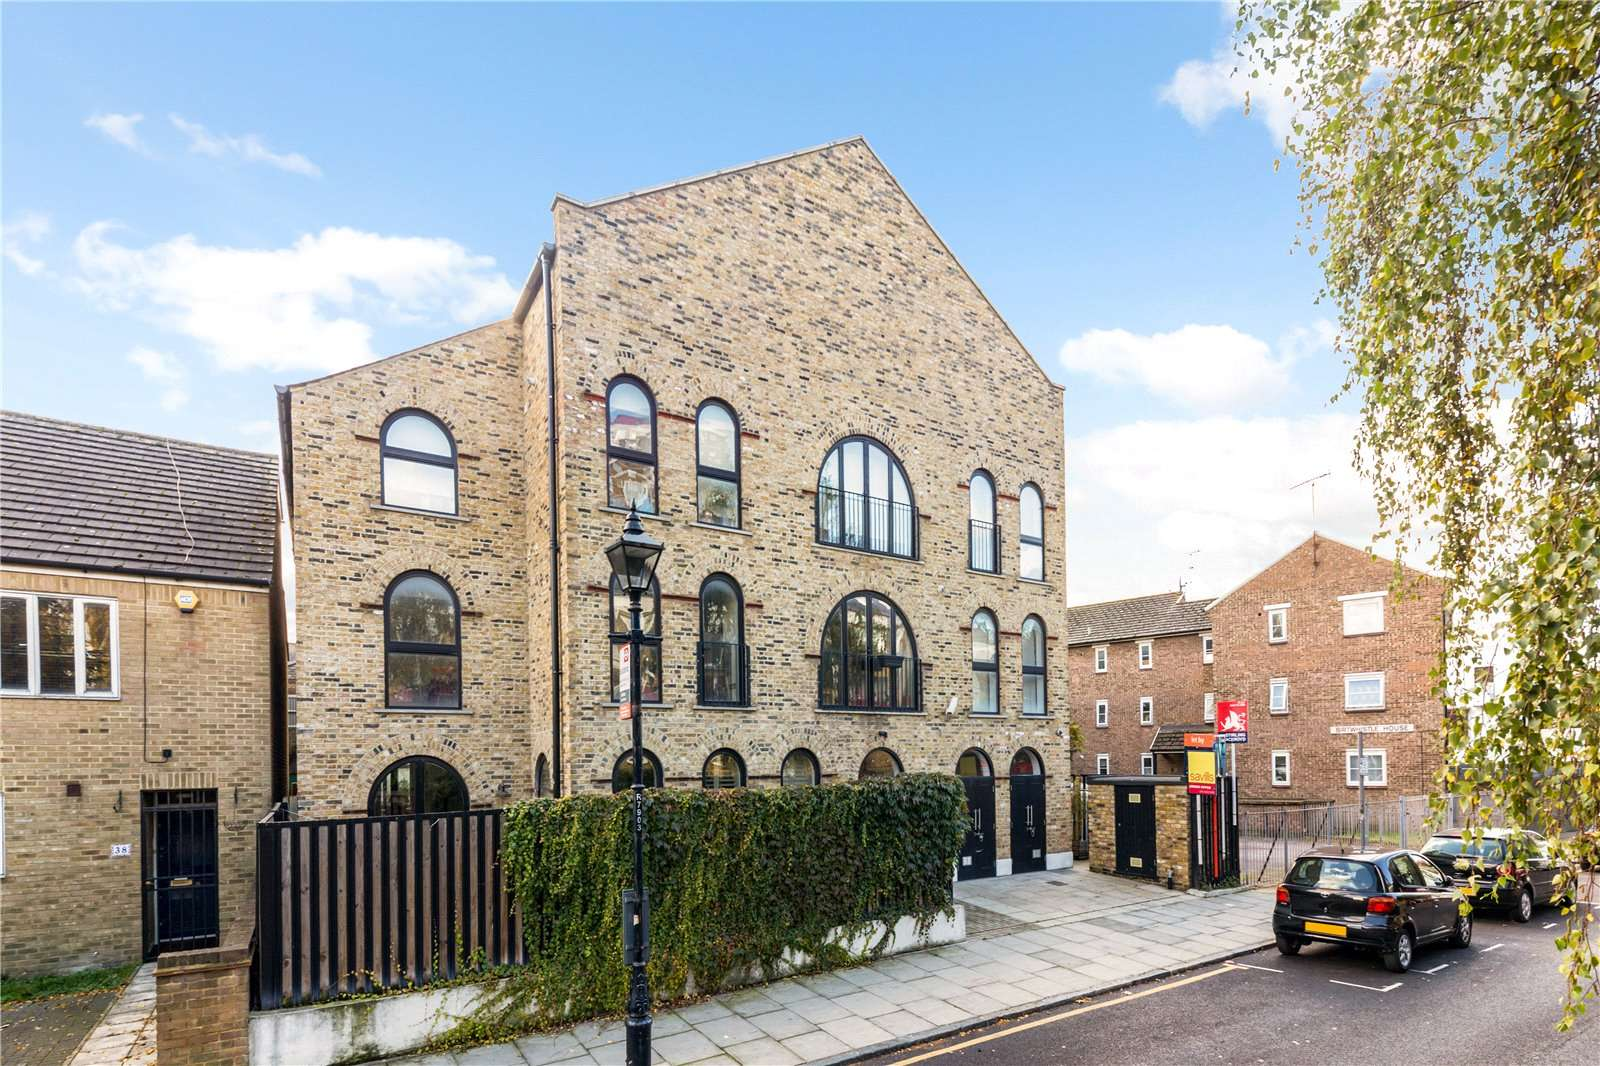 Savills Chapelford Apartments 42 Ruston Street London E3 2lr Property For Sale